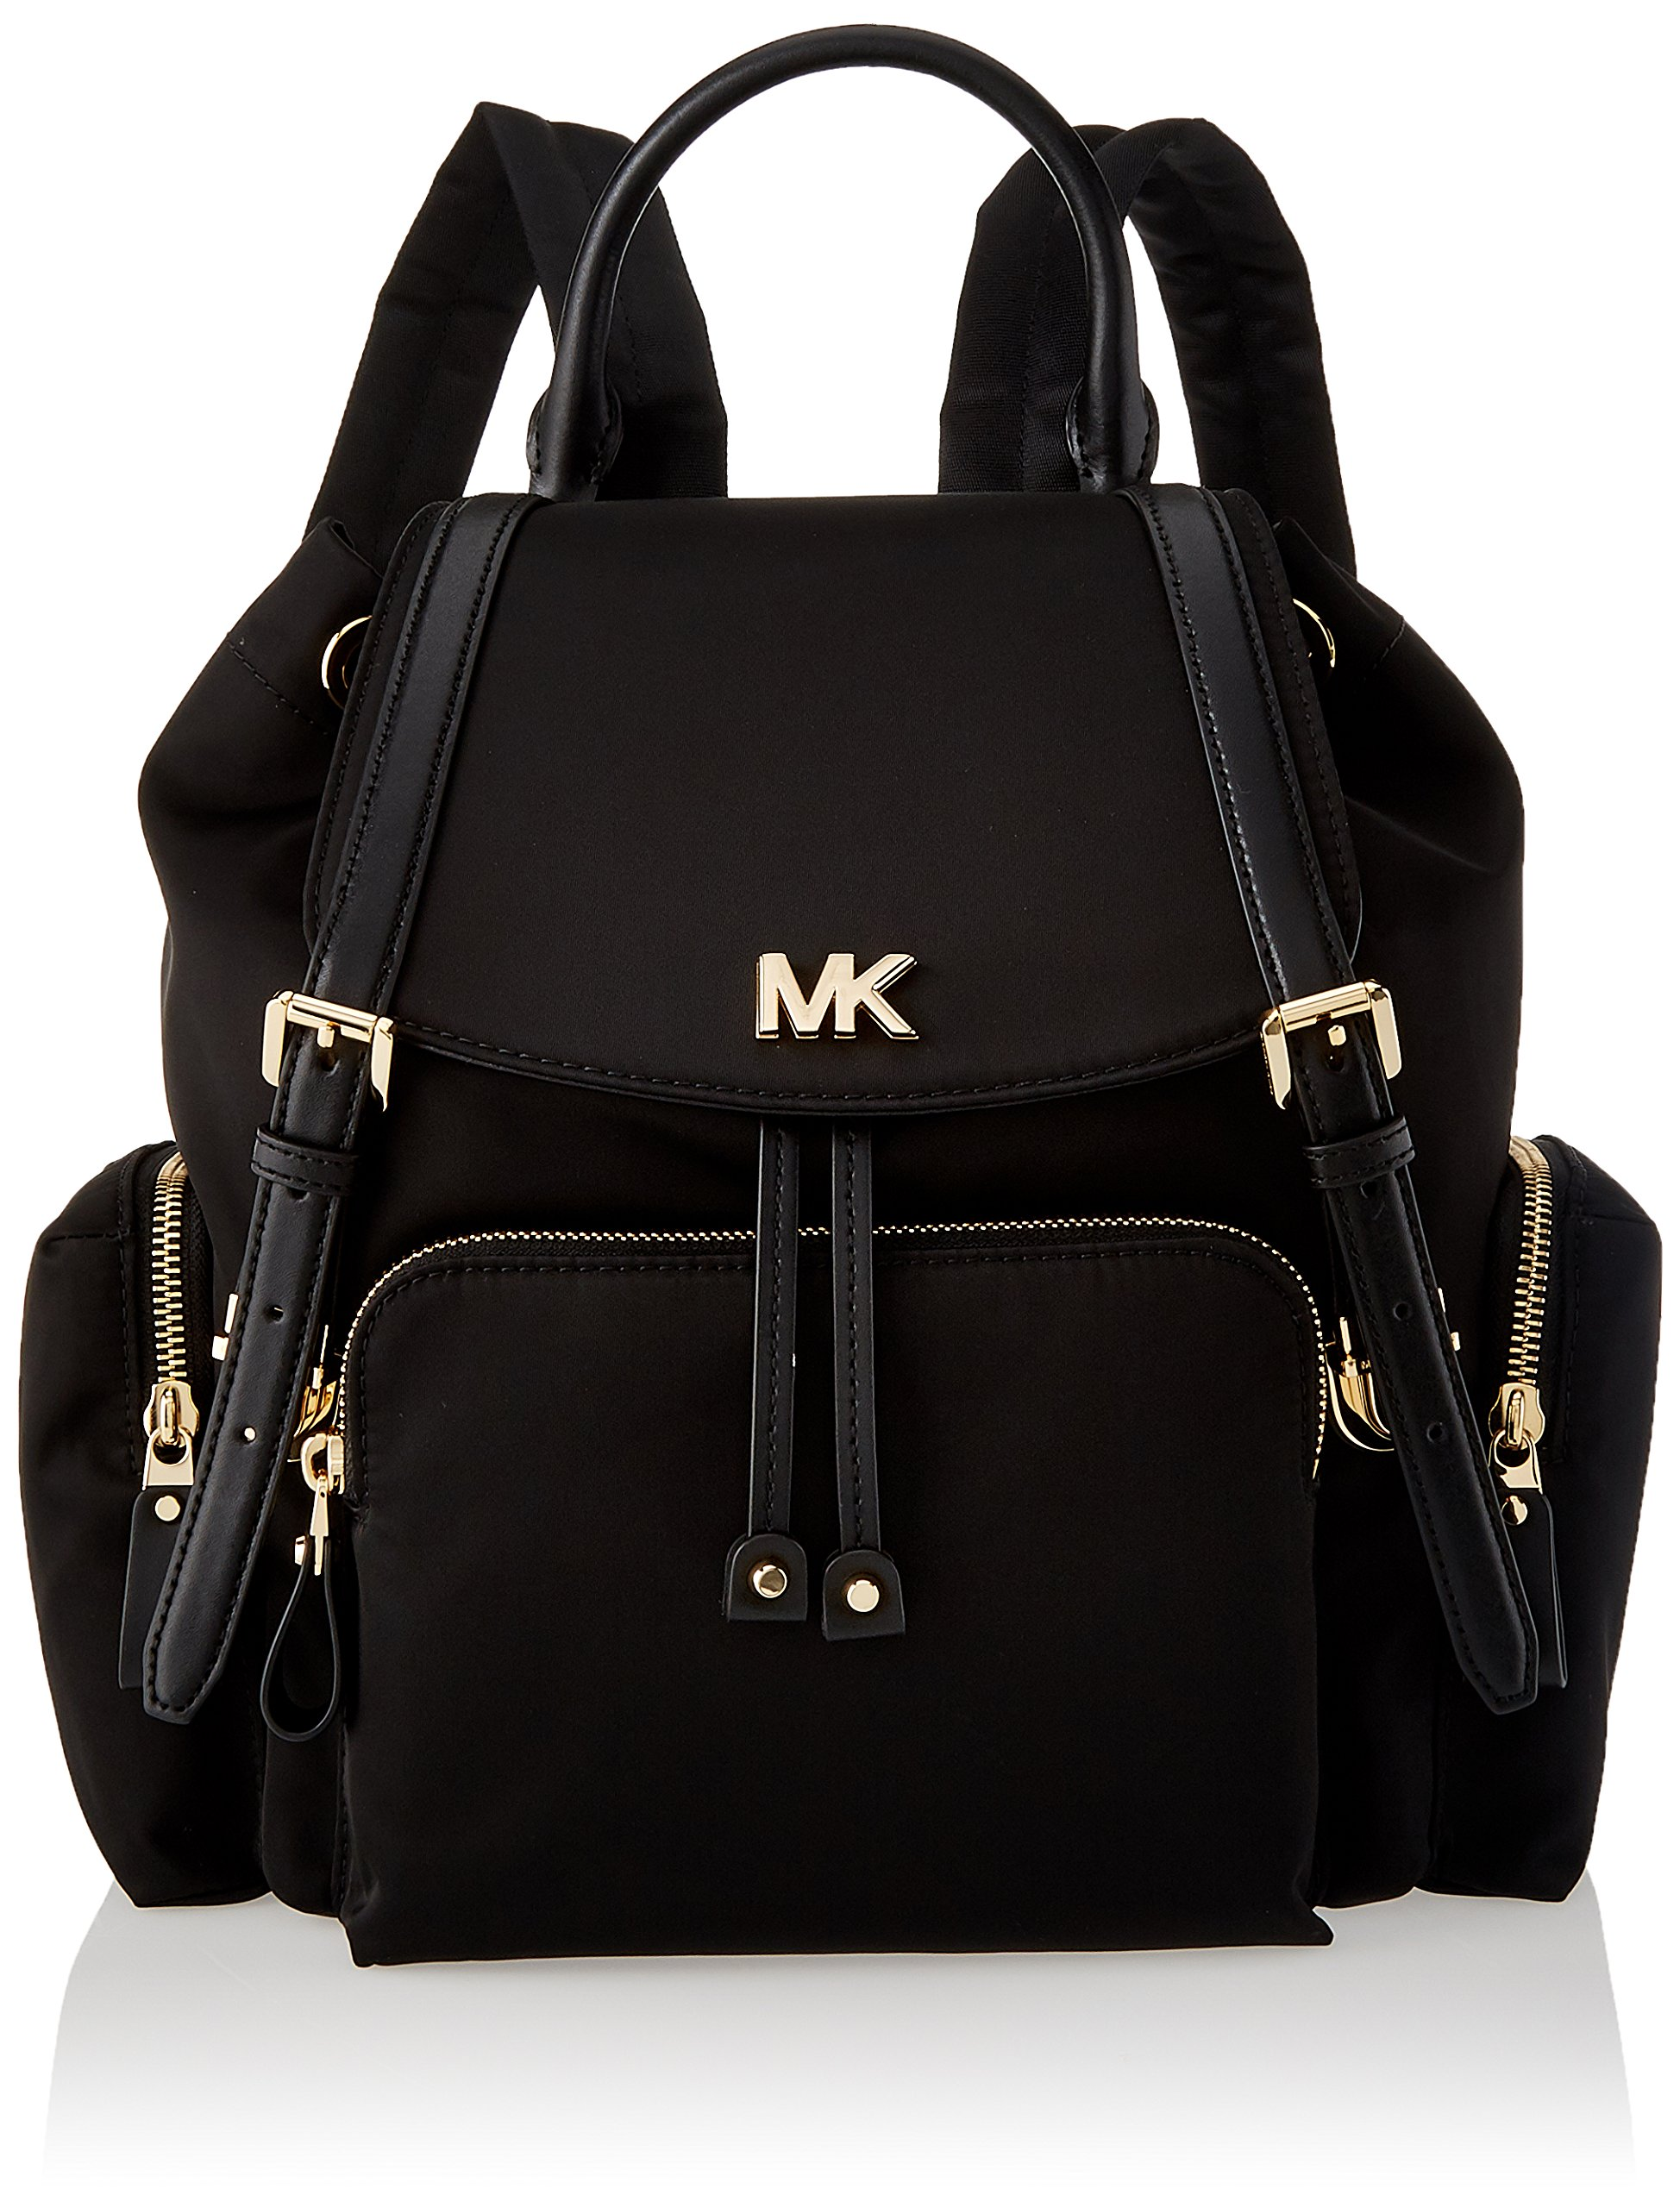 Michael Kors Womens Mott Md Backpack Backpack Handbag Black (Black) - fashion-backpacks